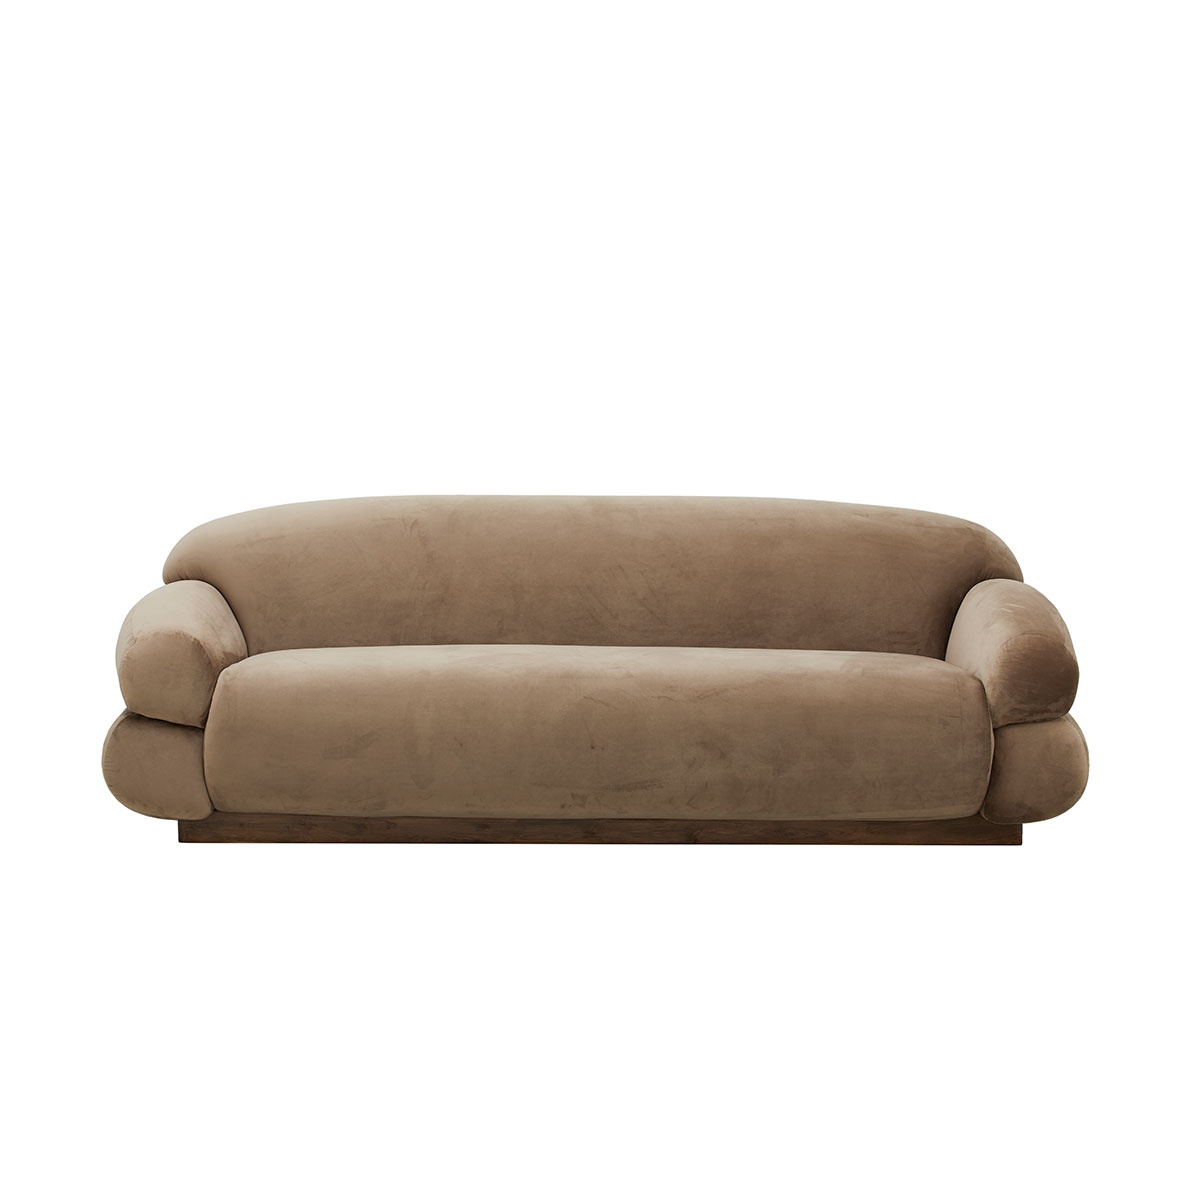 Sofa Sof Lys Brun